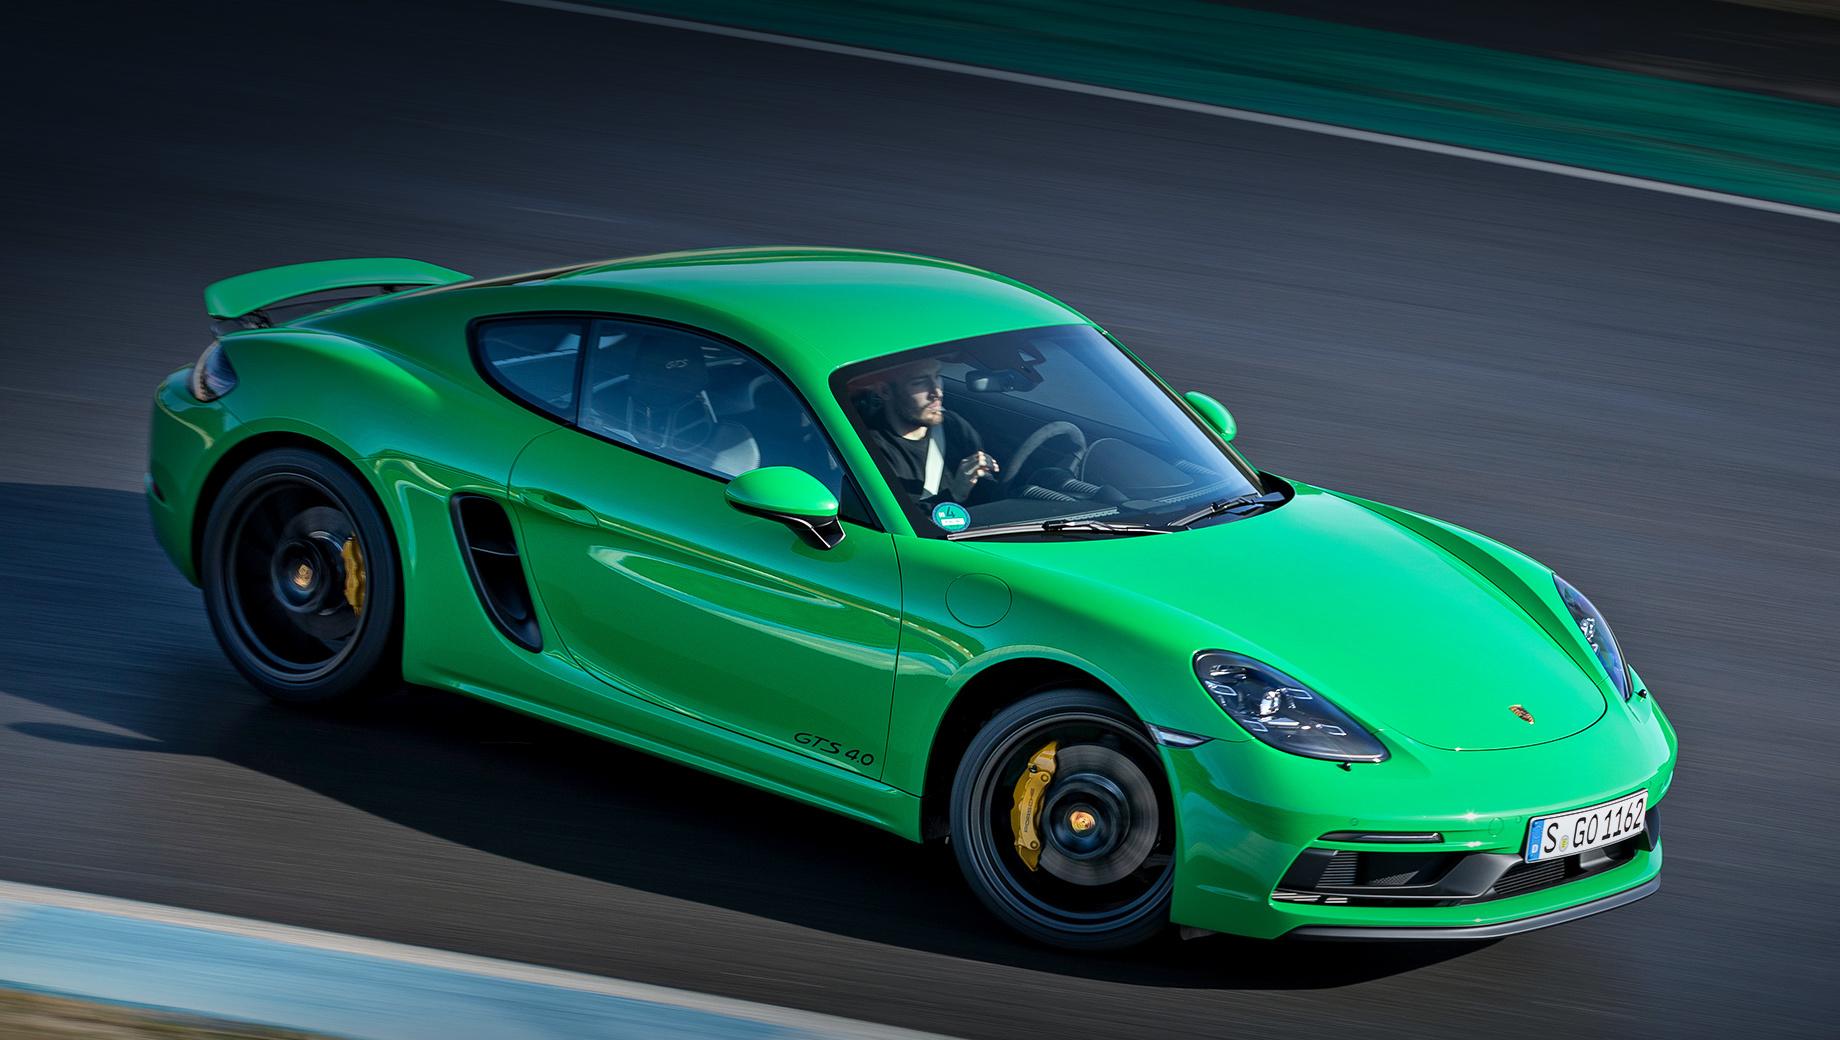 Porsche 718 Boxster и Cayman обогащены для рынка США